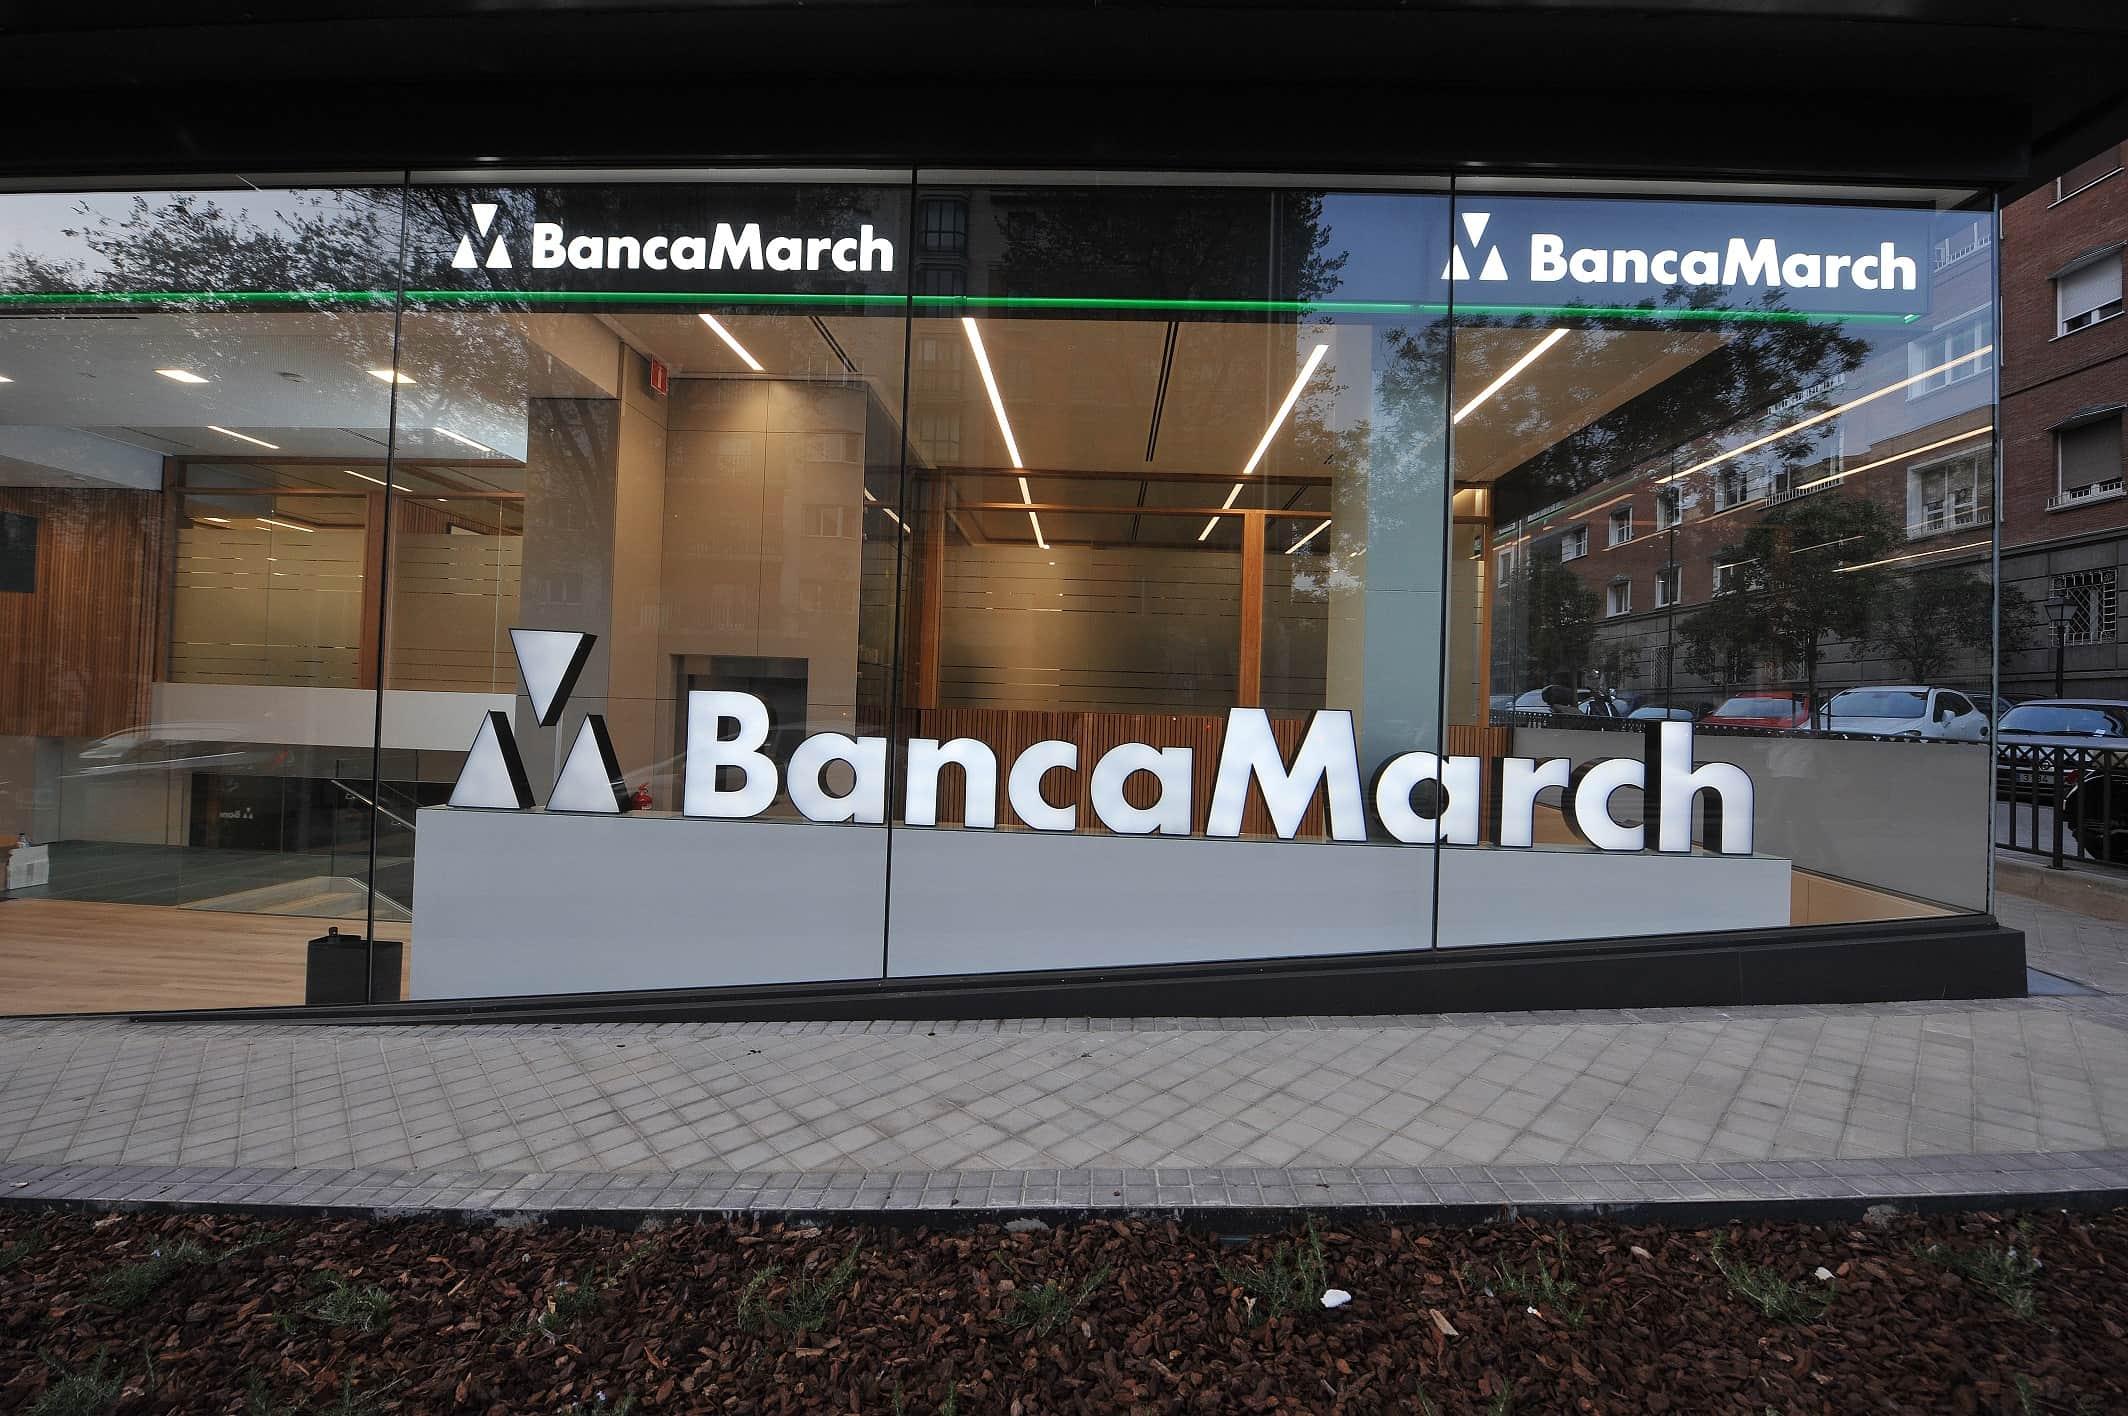 Banca March @BancaMarch